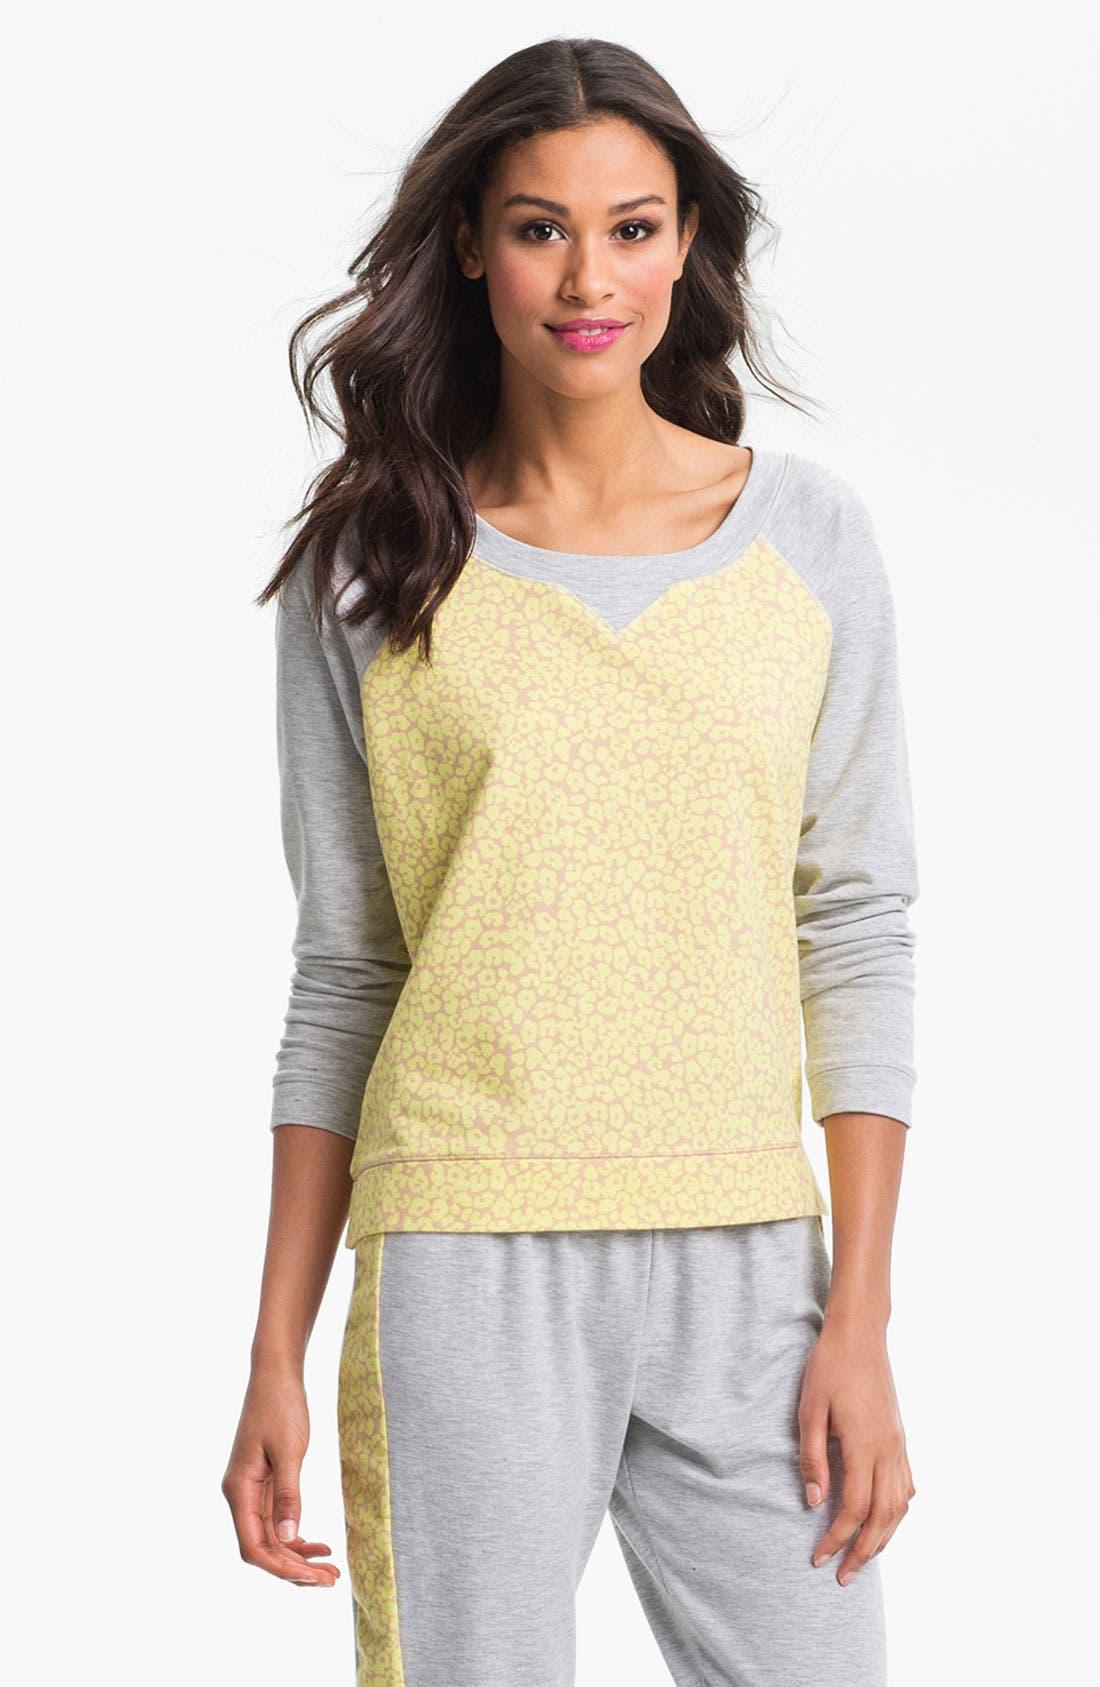 Main Image - Kensie 'Mix Master' Sweatshirt